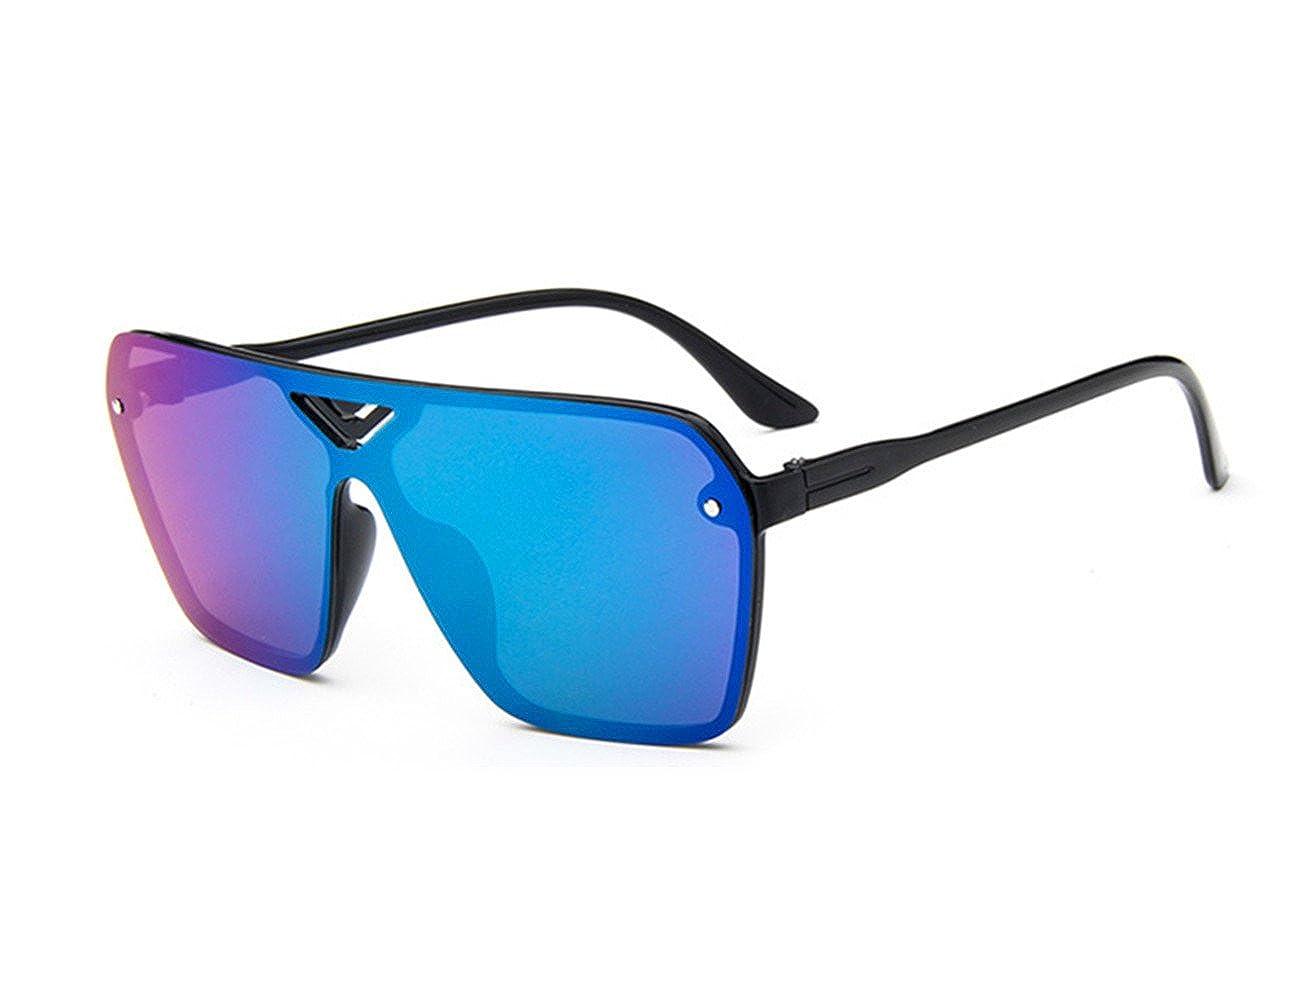 ViviClo Unisex Oversize Square Retro Modern Infinity Mirrored Flat Lens Shield Sunglasses